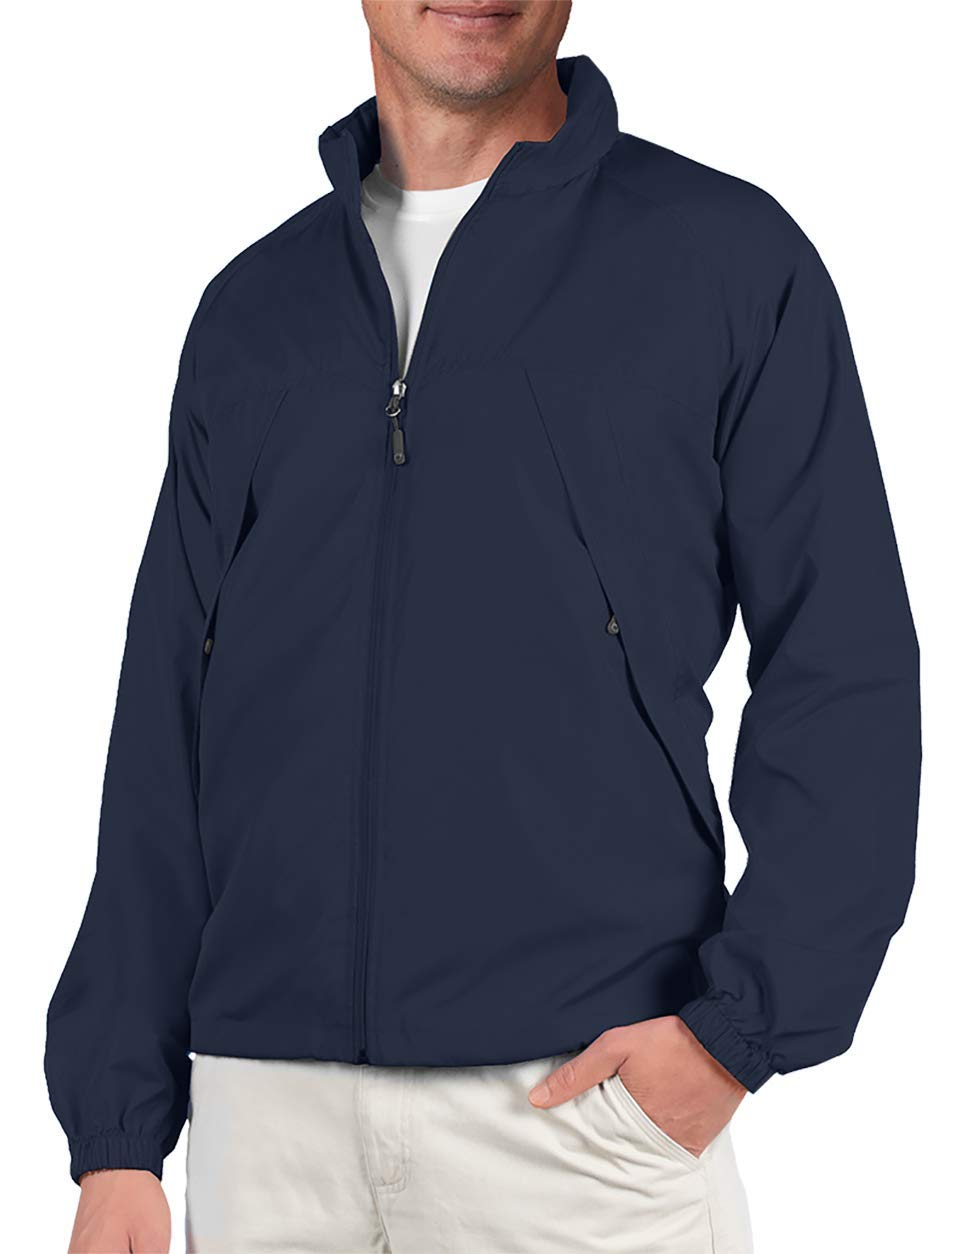 SCOTTeVEST Mens Pack Windbreaker Jacket - 19 Pockets - Spring Jackets for Men (NVY XXL) by SCOTTeVEST